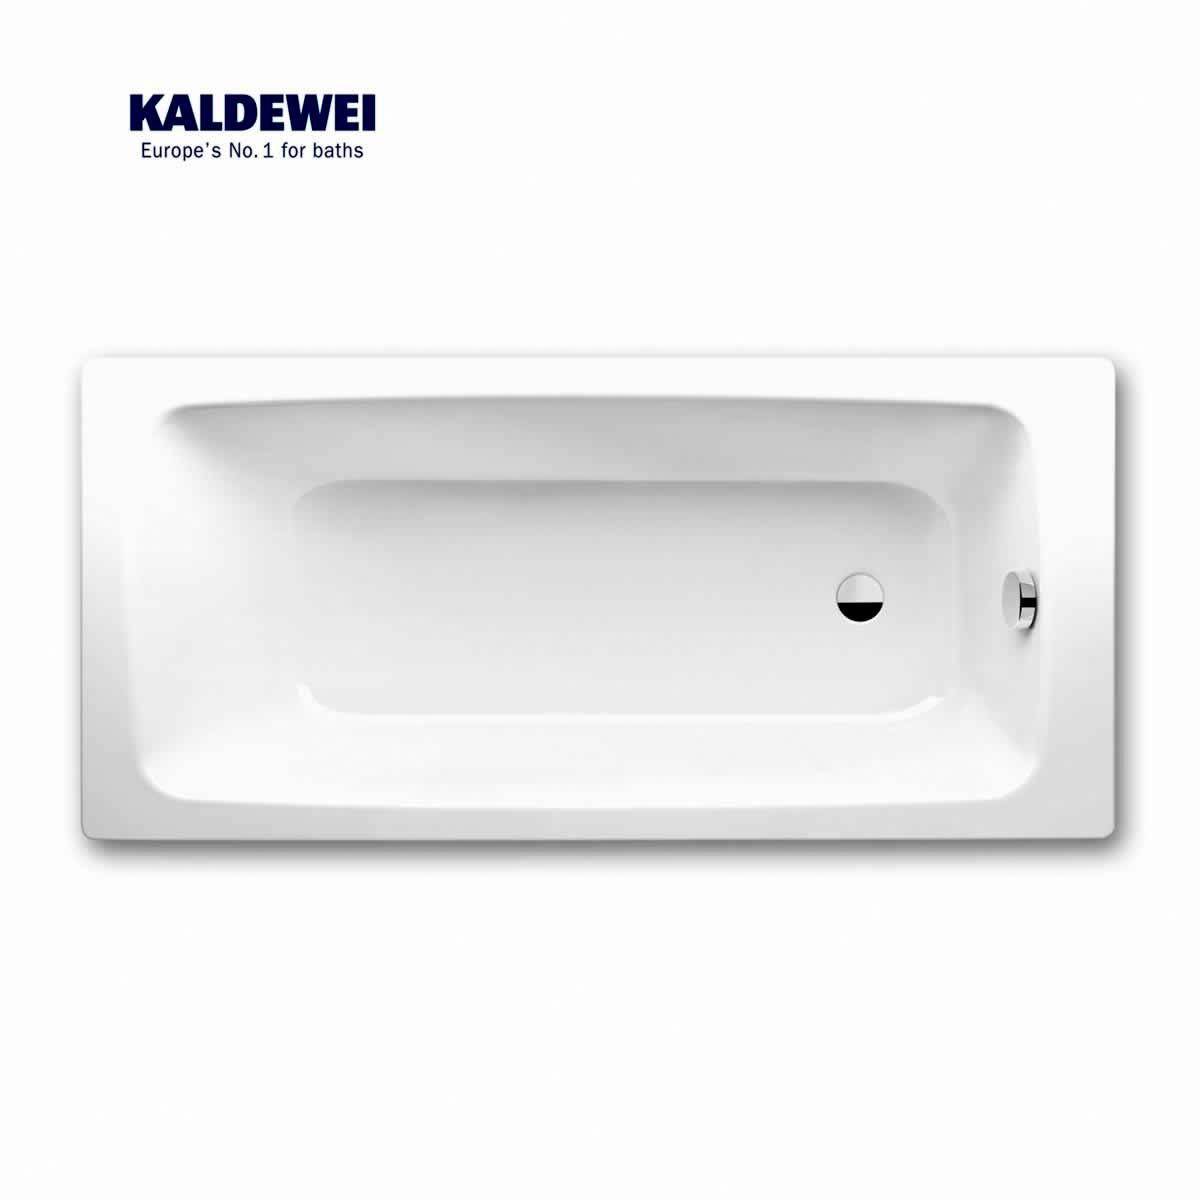 Kaldewei Cayono Luxury Steel Bath   Bathrooms Direct Yorkshire